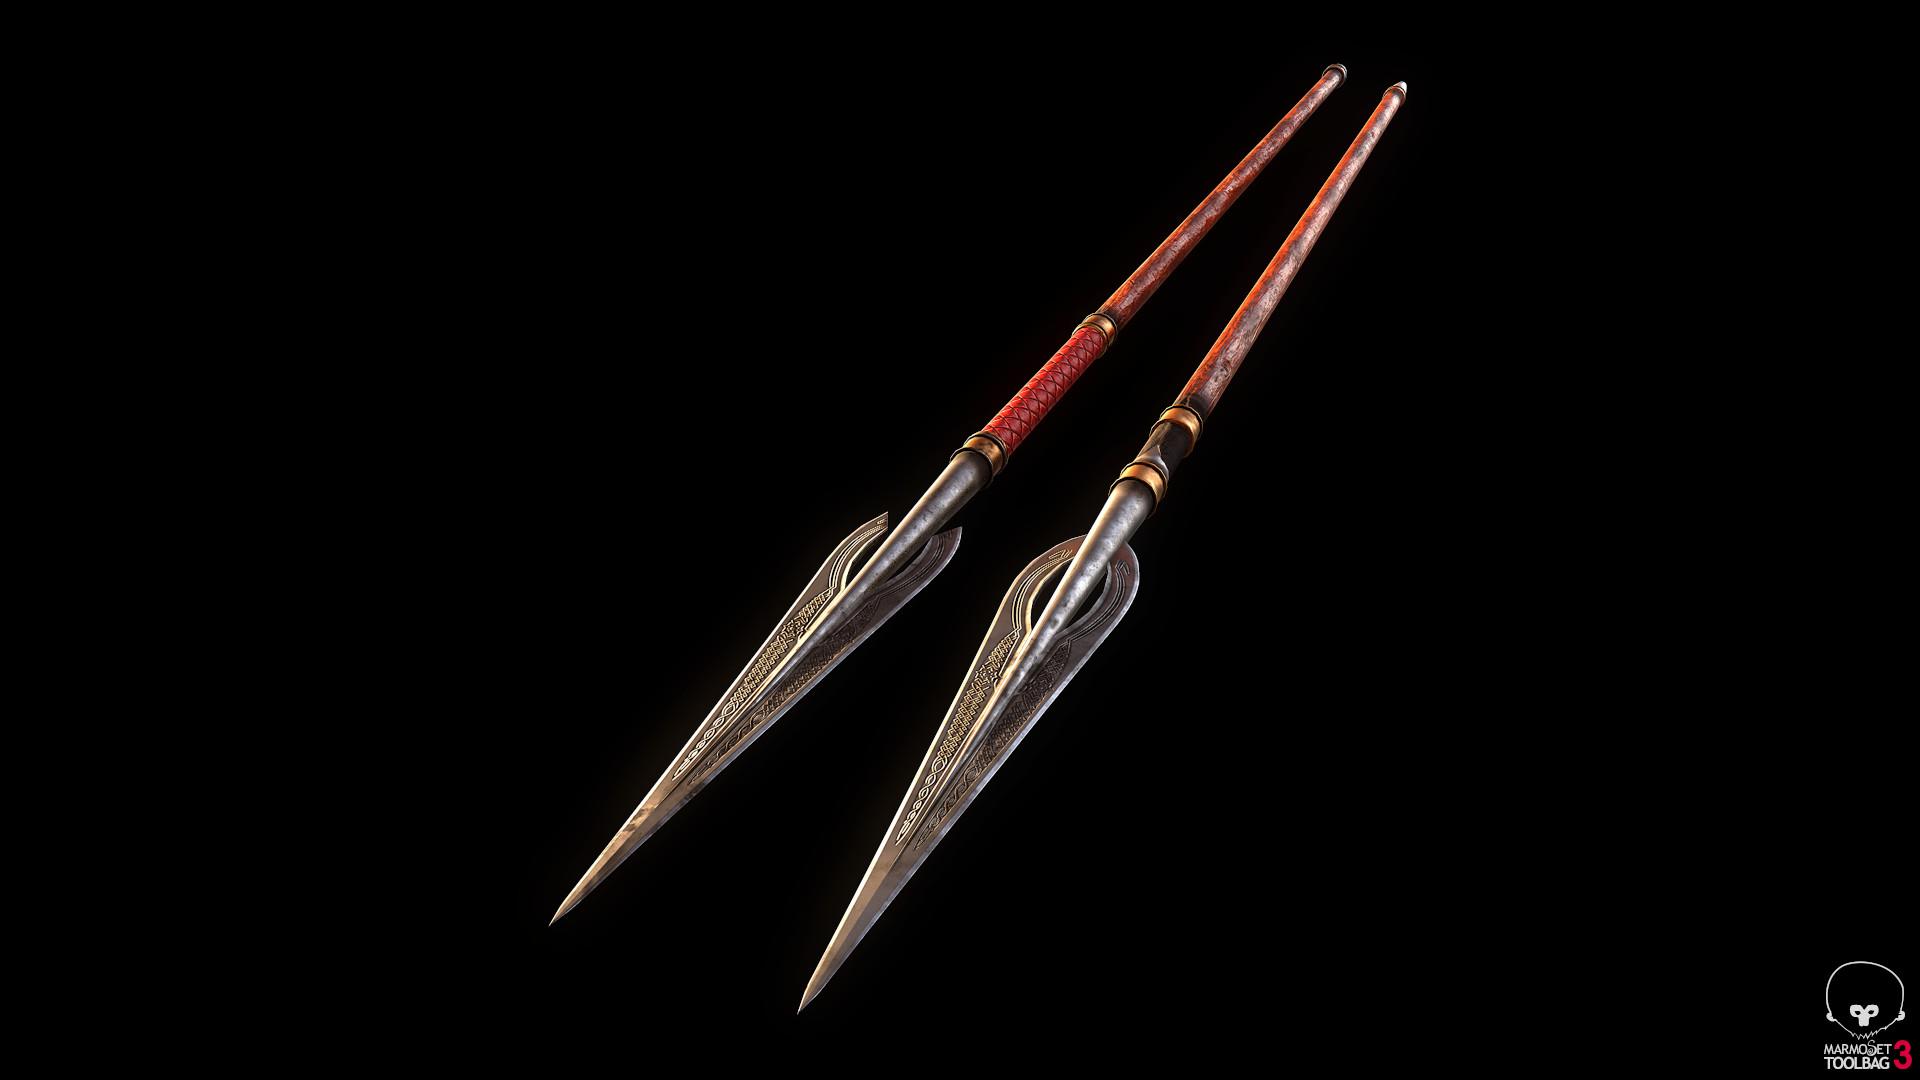 Bela csampai s4h rohan spear ornate 01 render mt 02